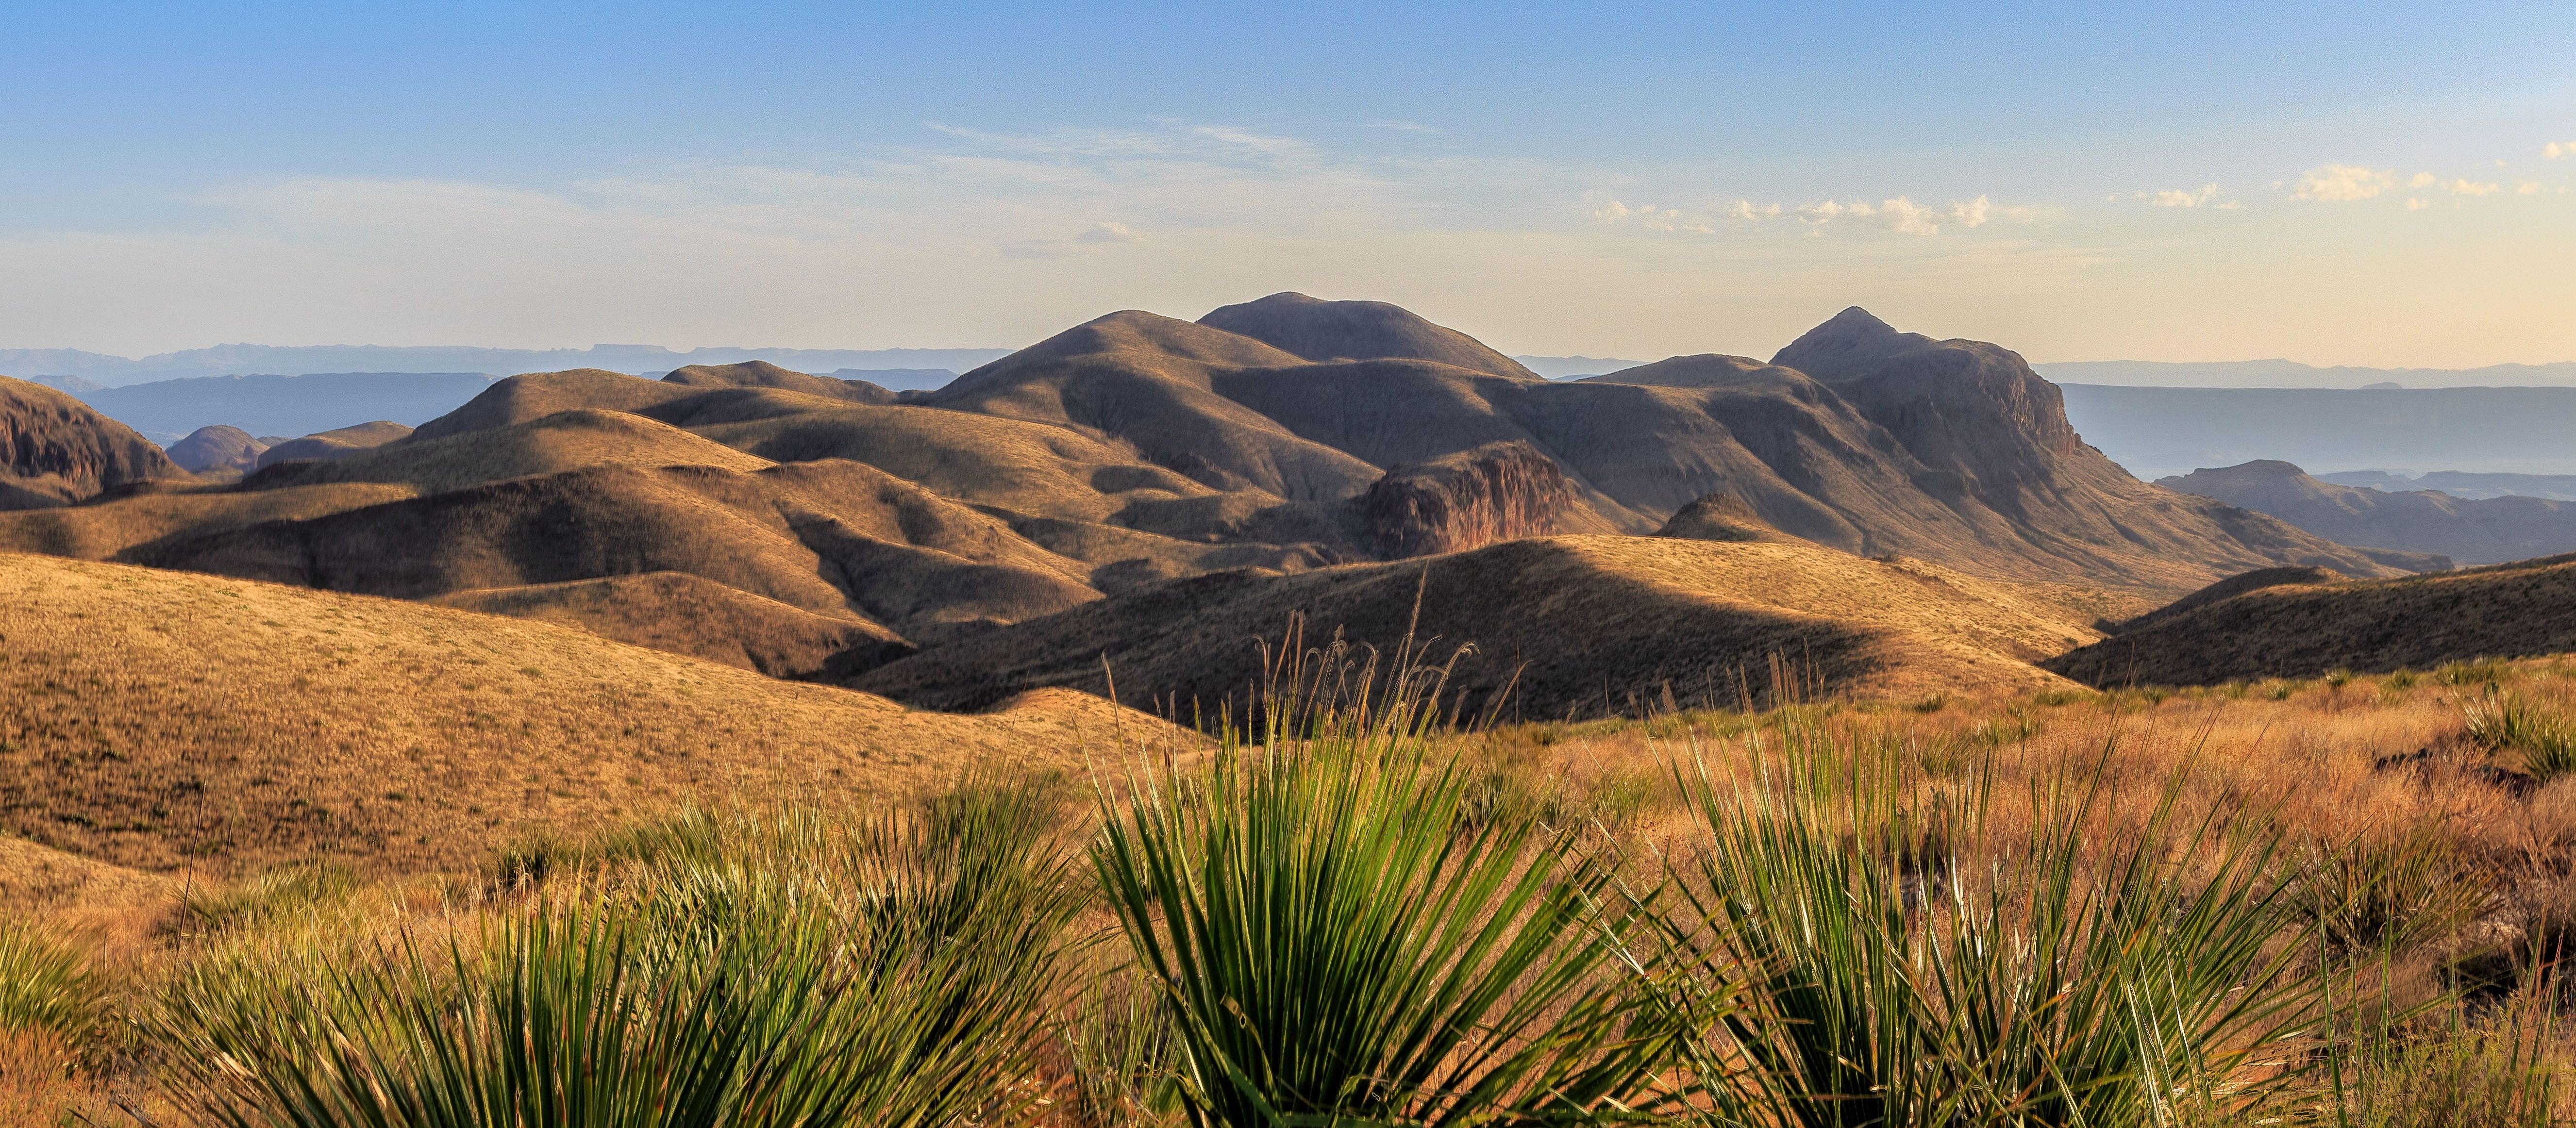 Atemberaubende Landschaft des Big-Bend-Nationalparks in Texas